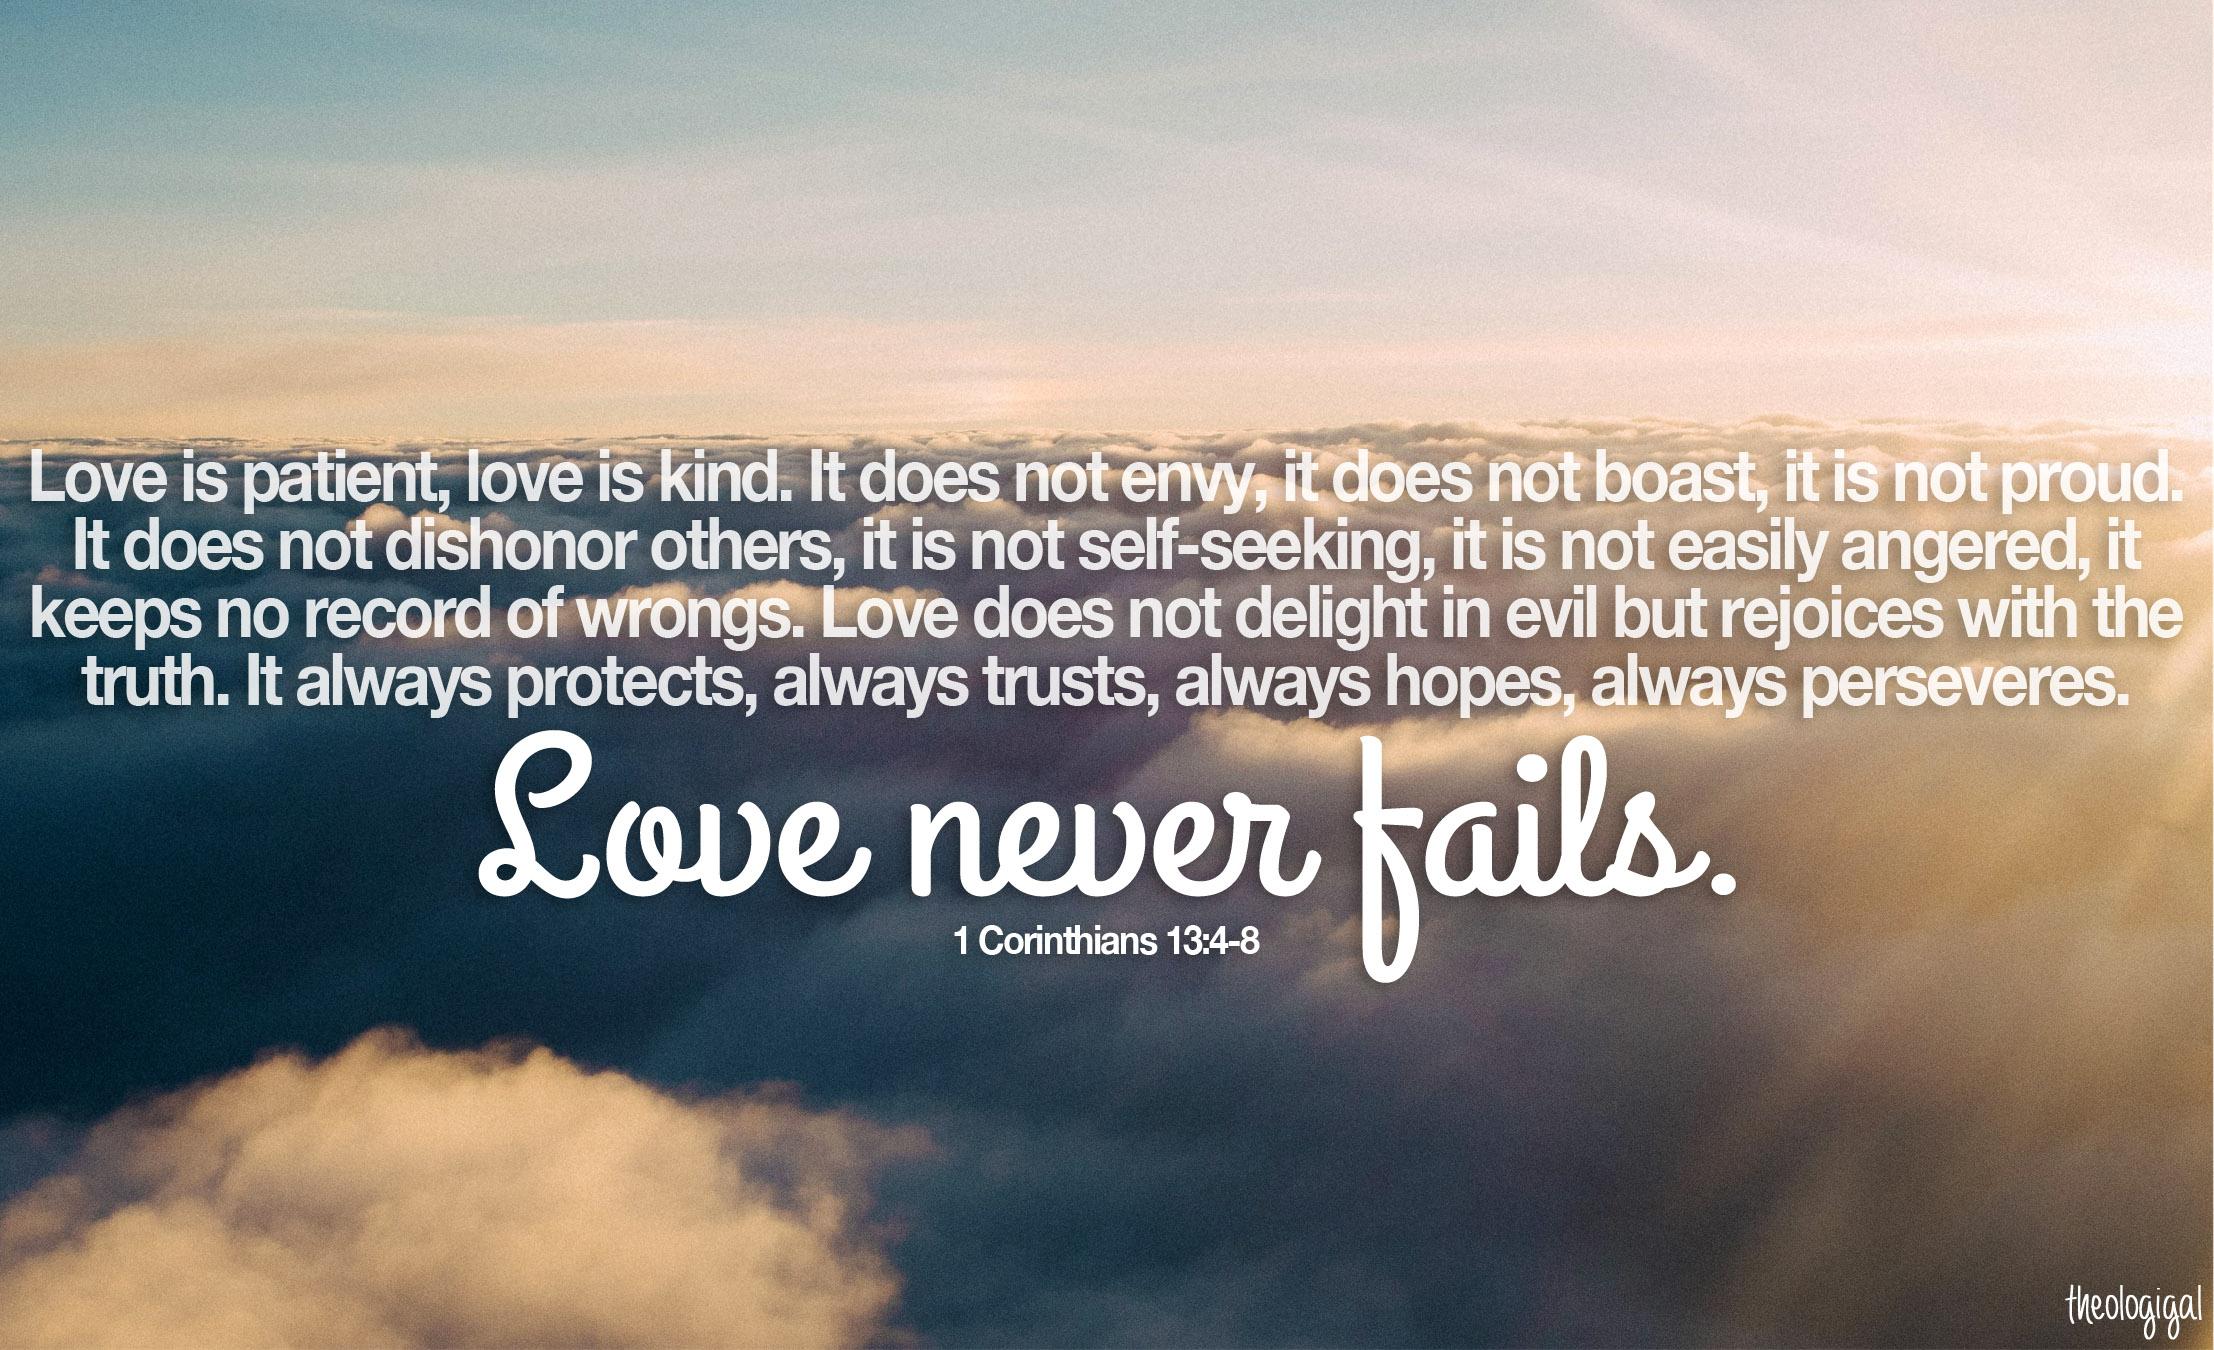 love bible verses 1 corinthians images pictures becuo